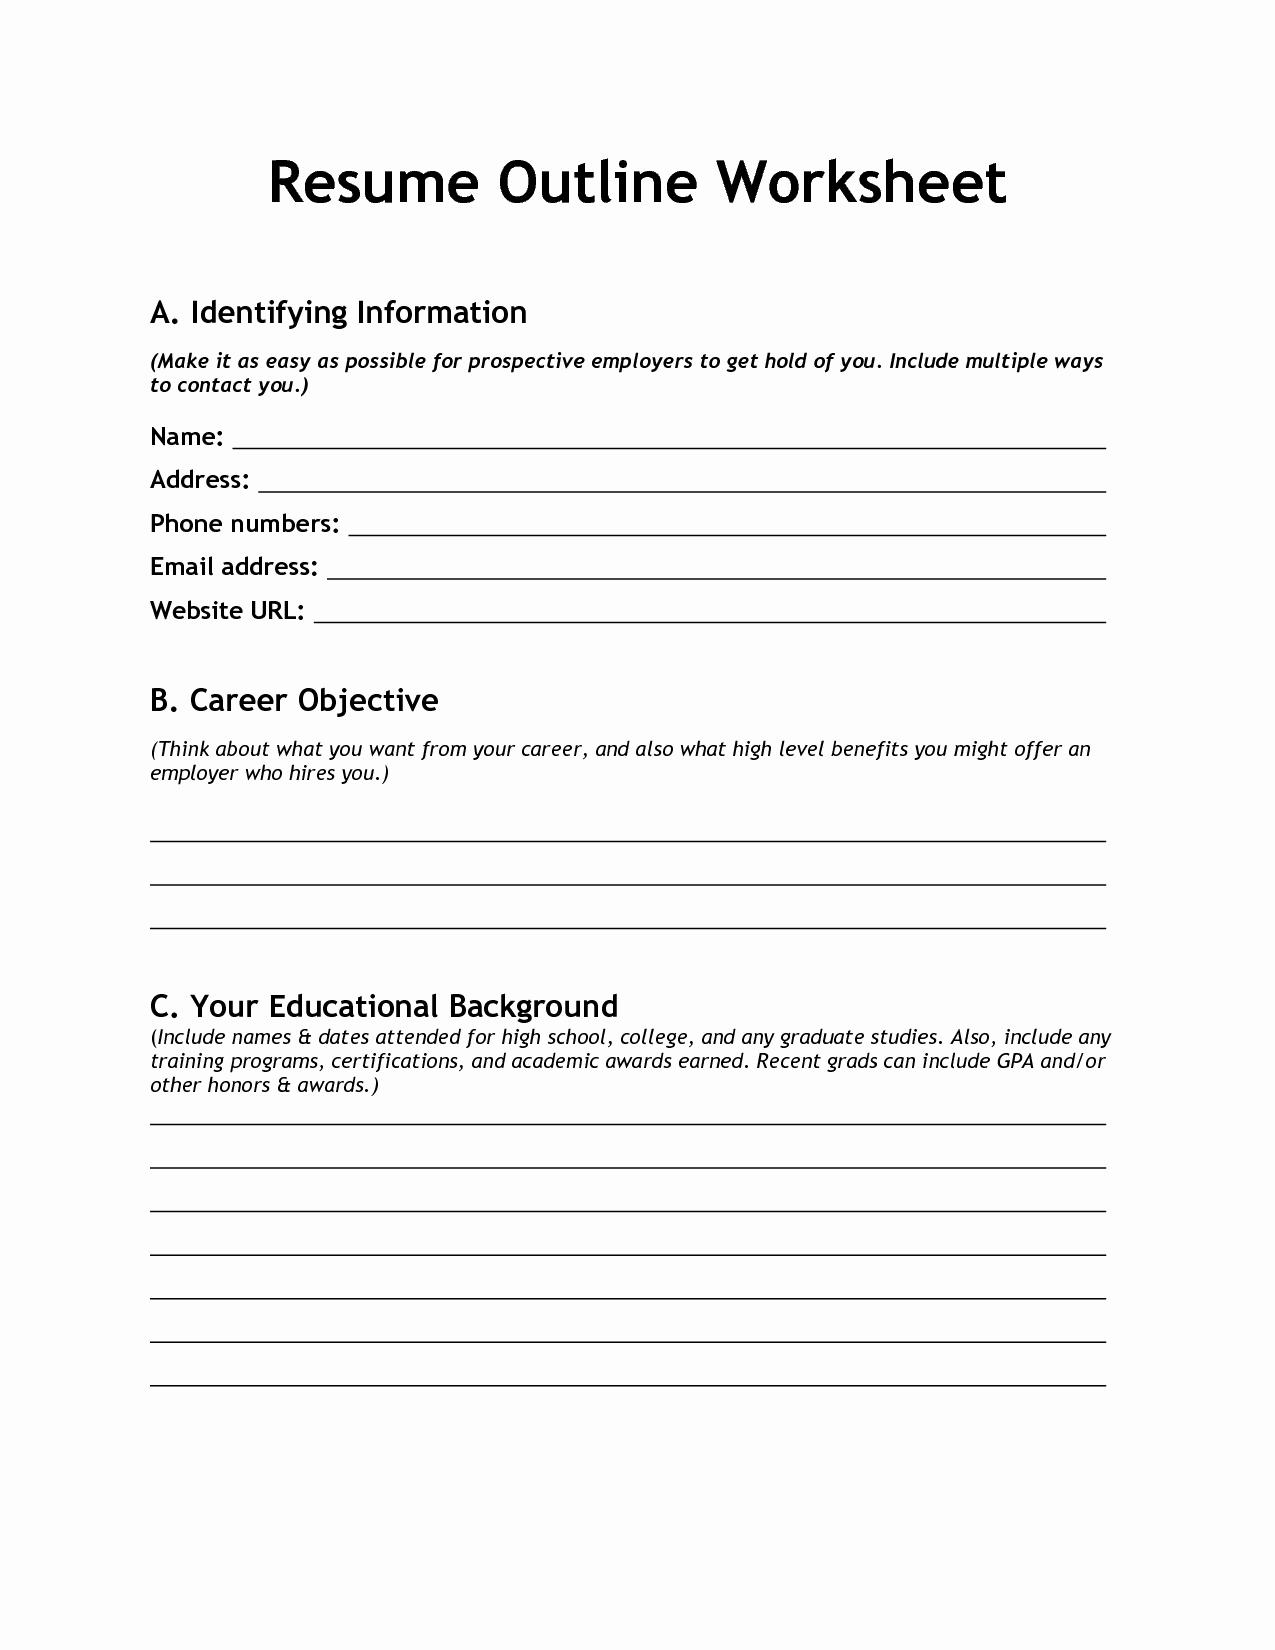 Resume Worksheet for Adults Awesome Resume Building Worksheet